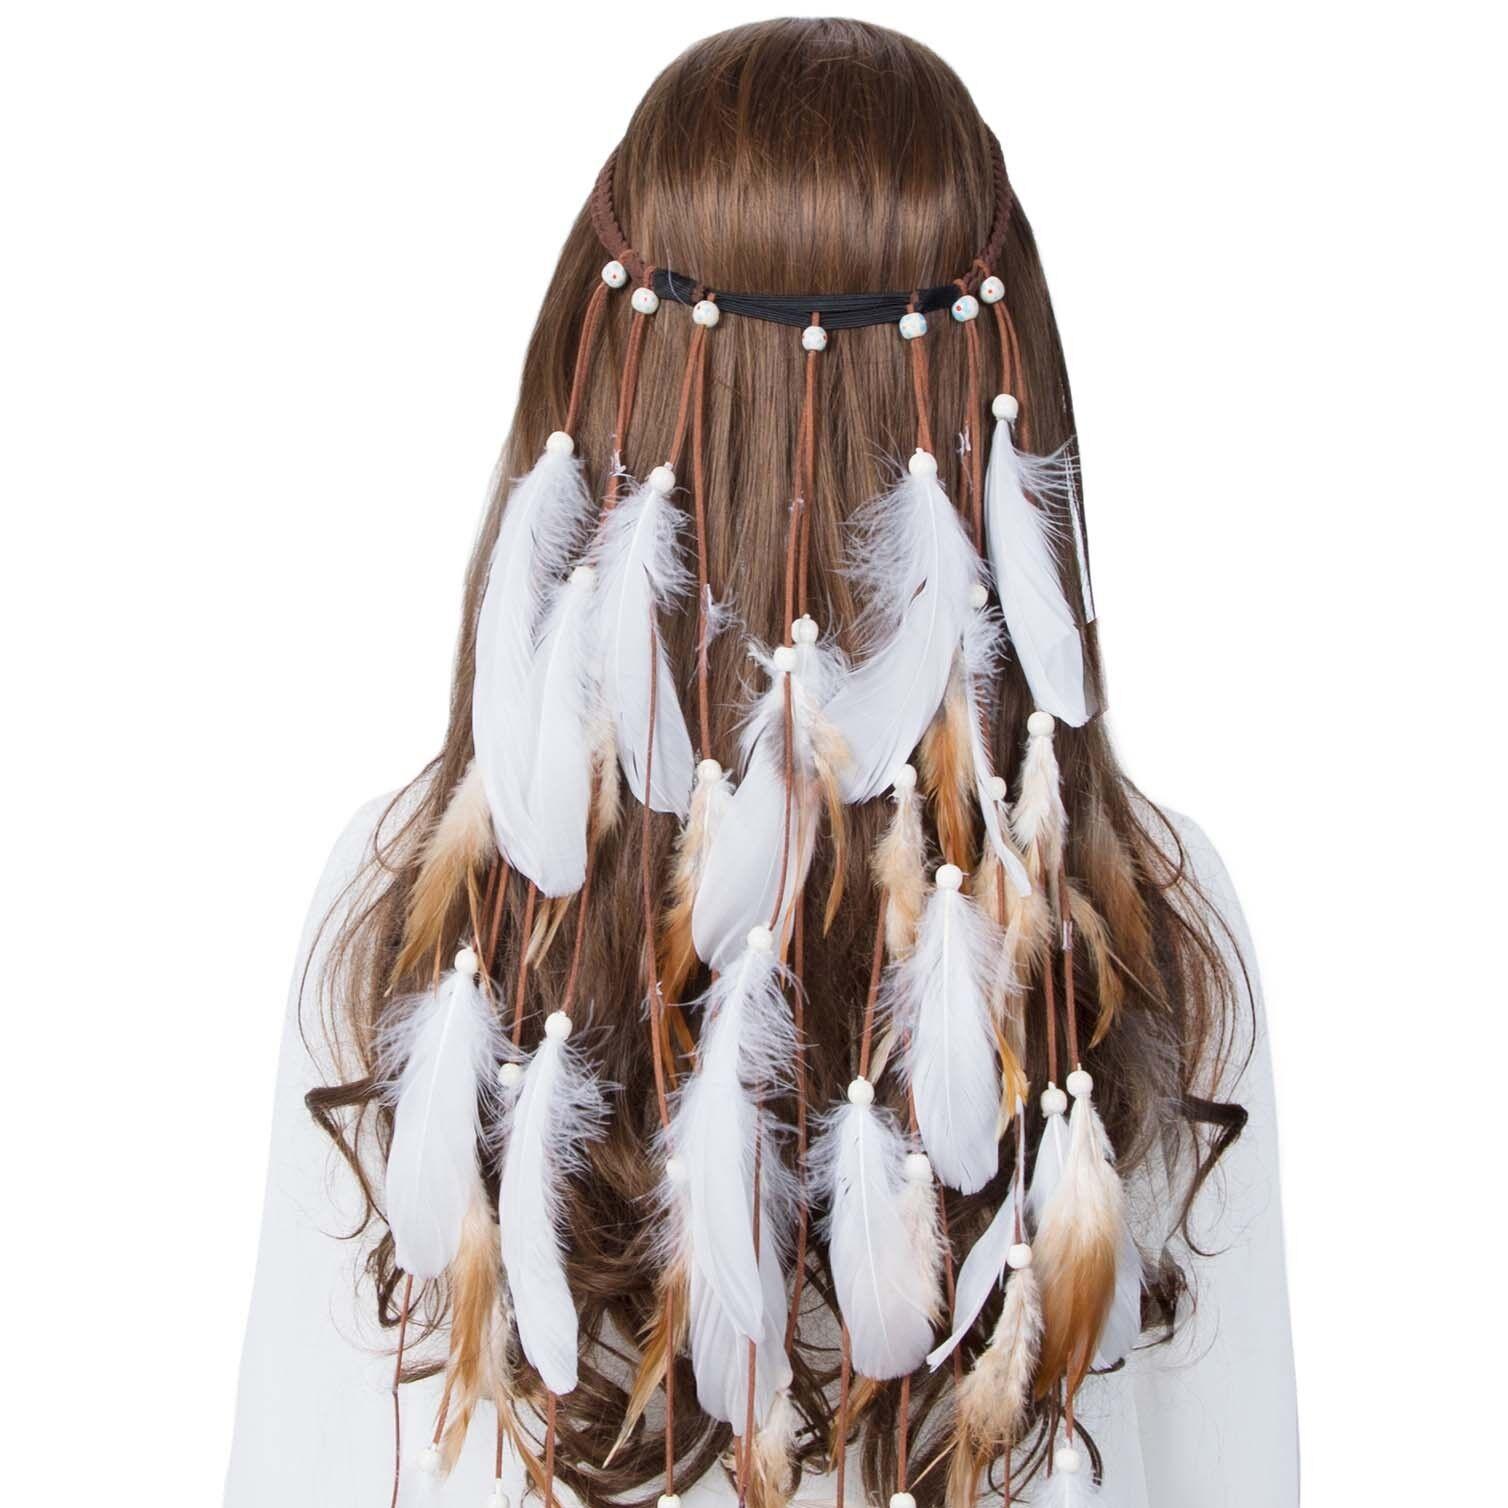 Boho Womens Indian Tassel Feather Hippie Tribal Headband Costume Carnival Party